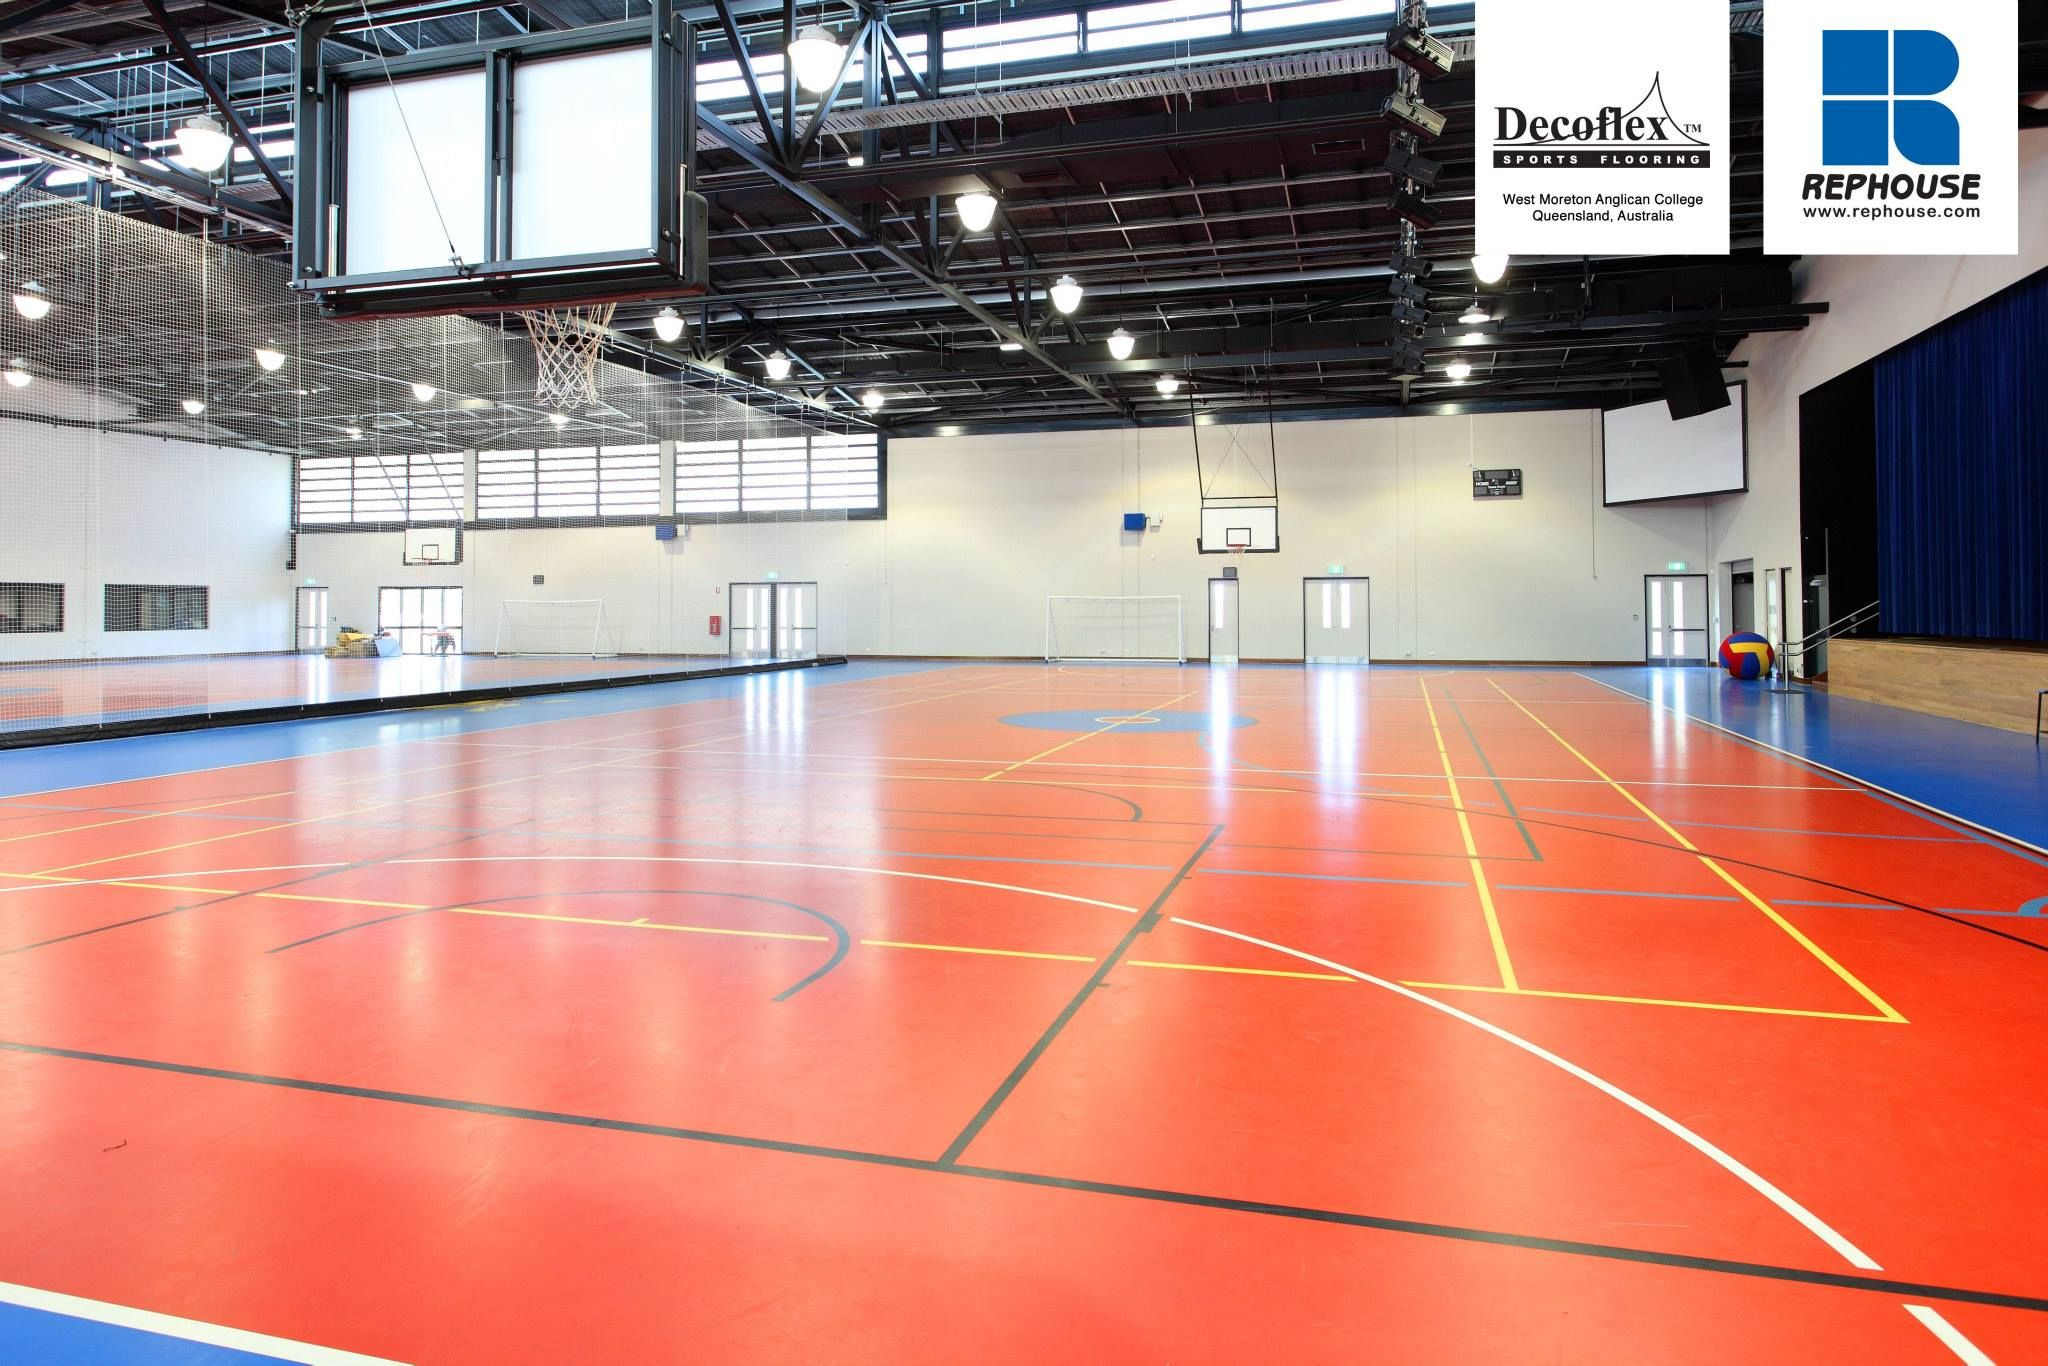 Decoflex Universal Seamless Polyurethane Indoor Sports Flooring West Moreton Anglican College Australia Indoor Sports Universal Indoor